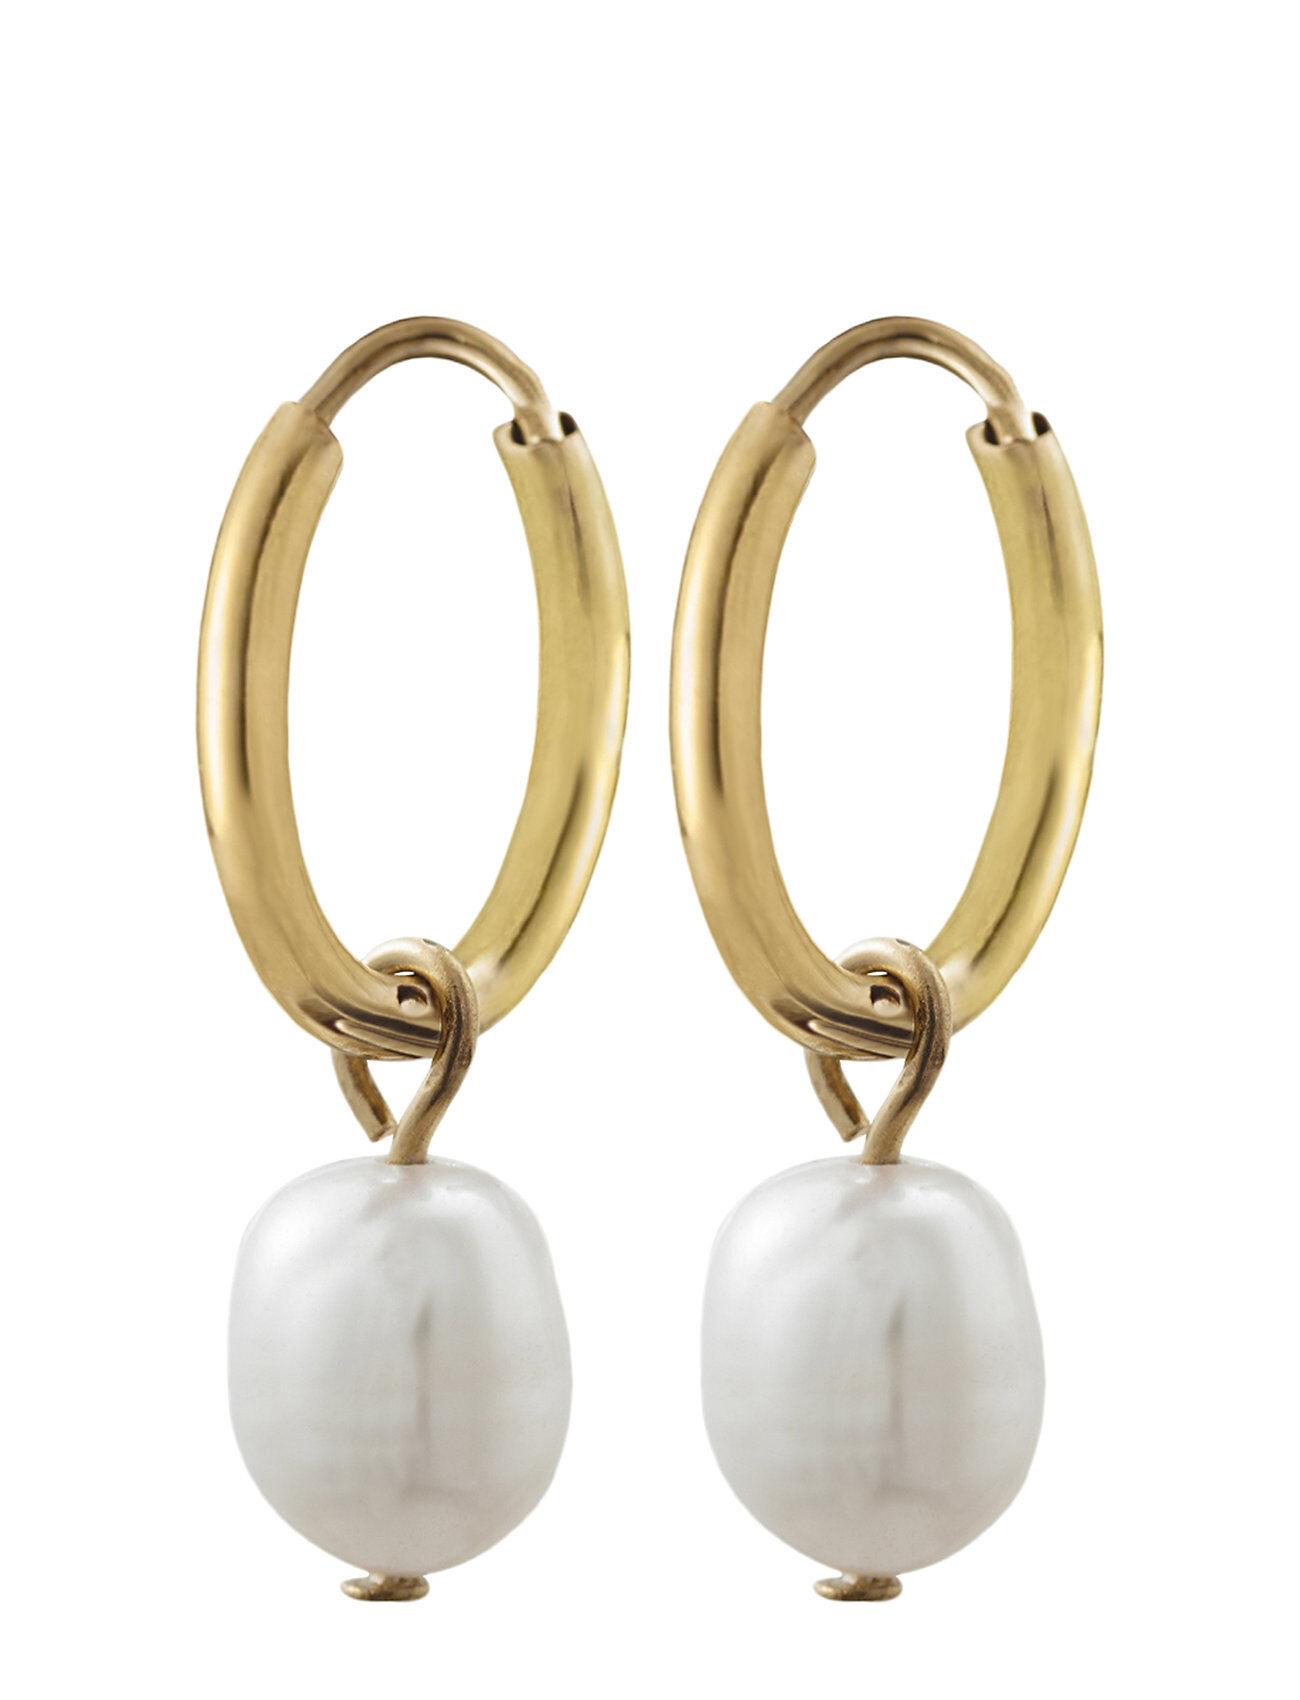 Edblad Perla Earrings Creole Gold Accessories Jewellery Earrings Hoops Kulta Edblad